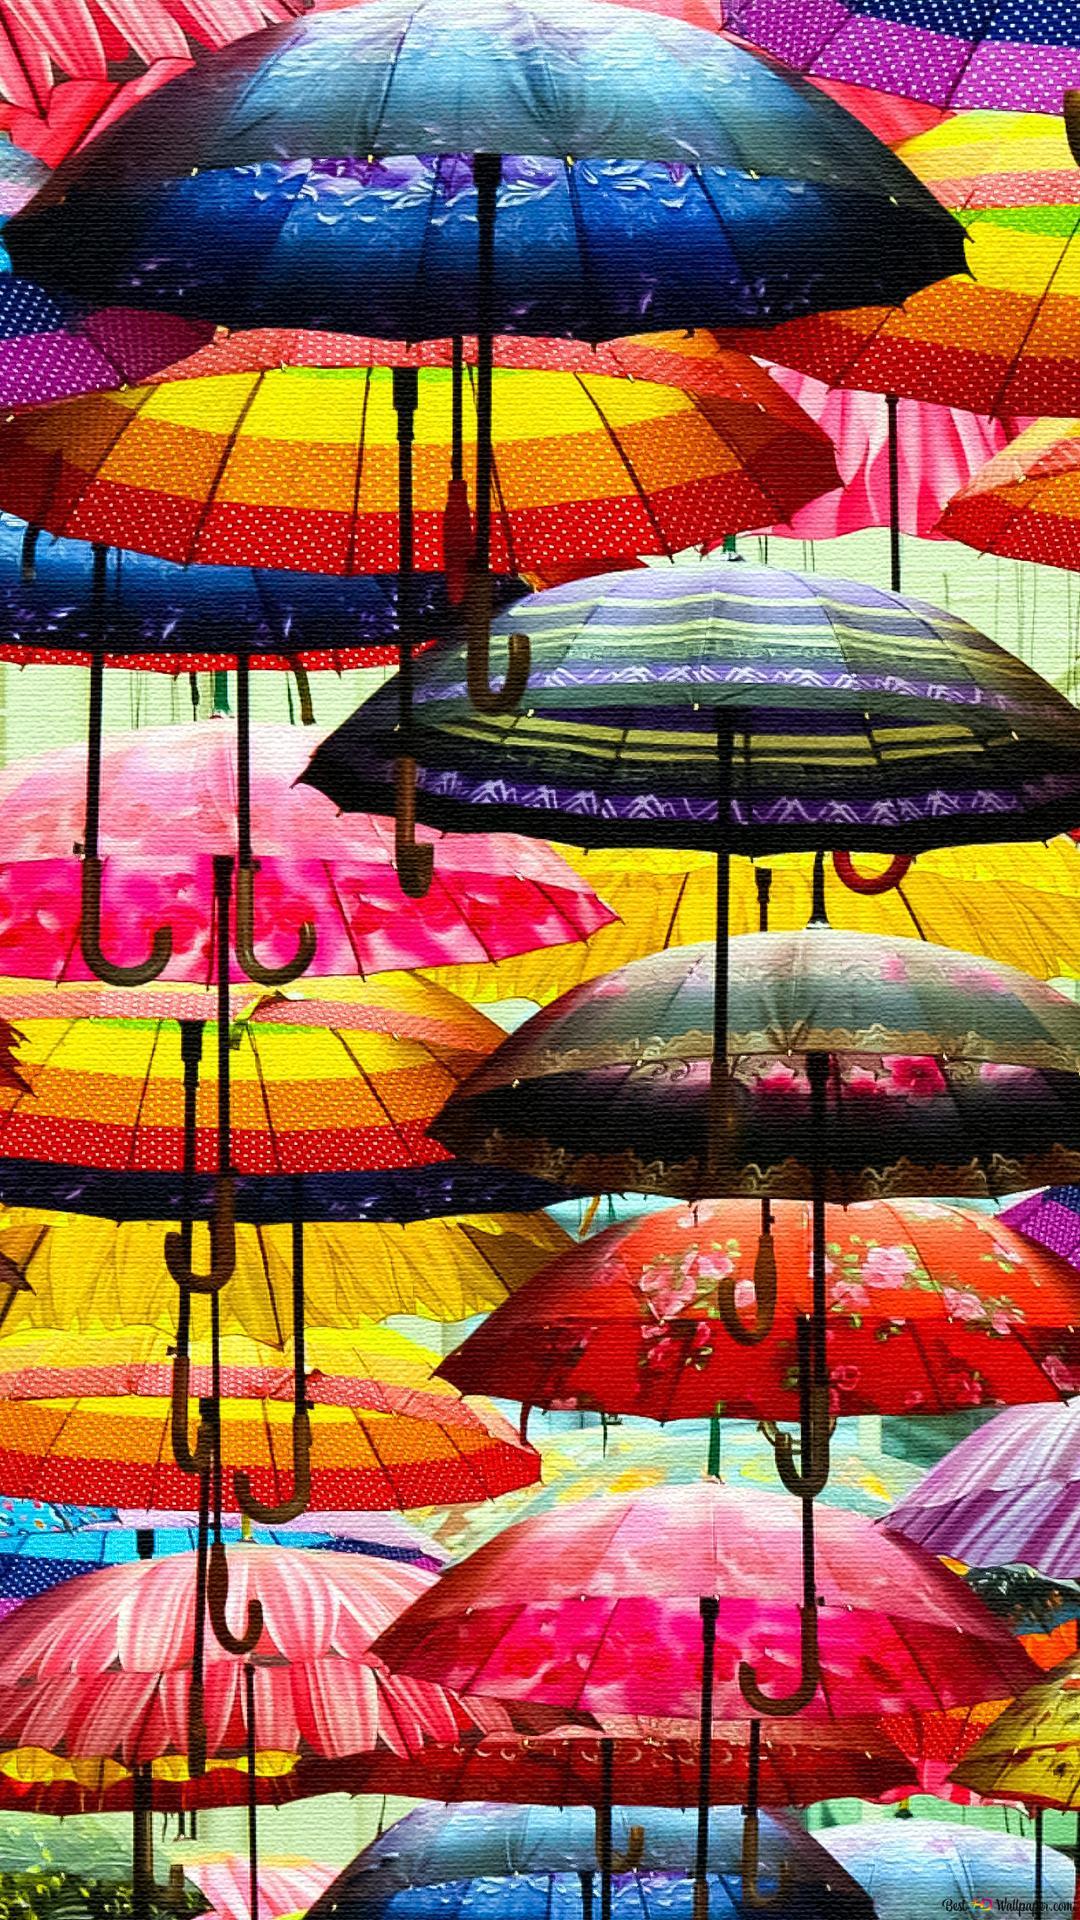 Hanging Colorful Umbrellas Hd Wallpaper Download